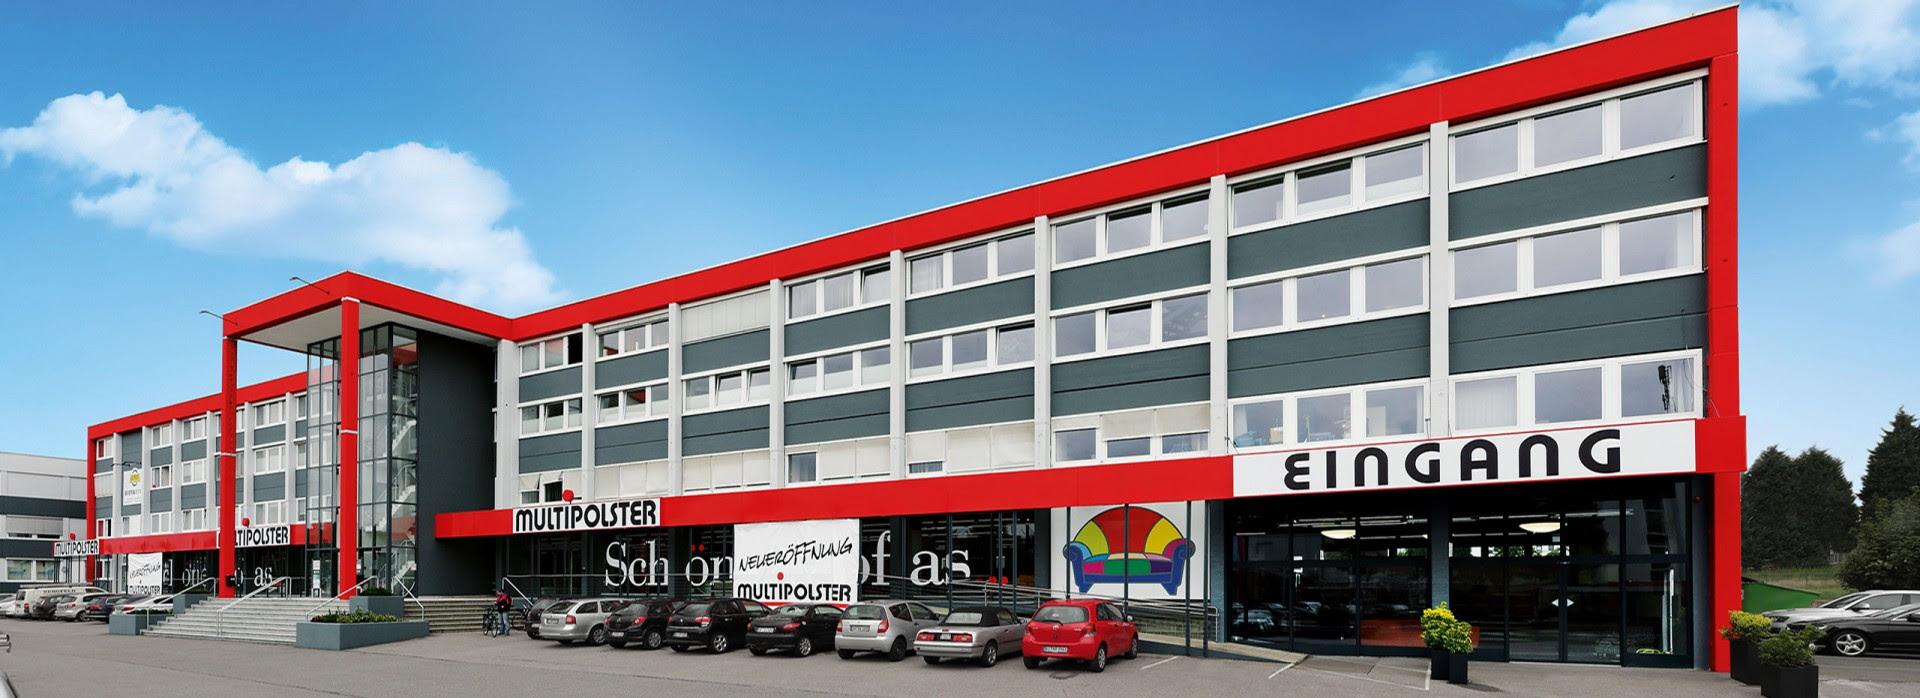 Möbel Akut In Bielefeld